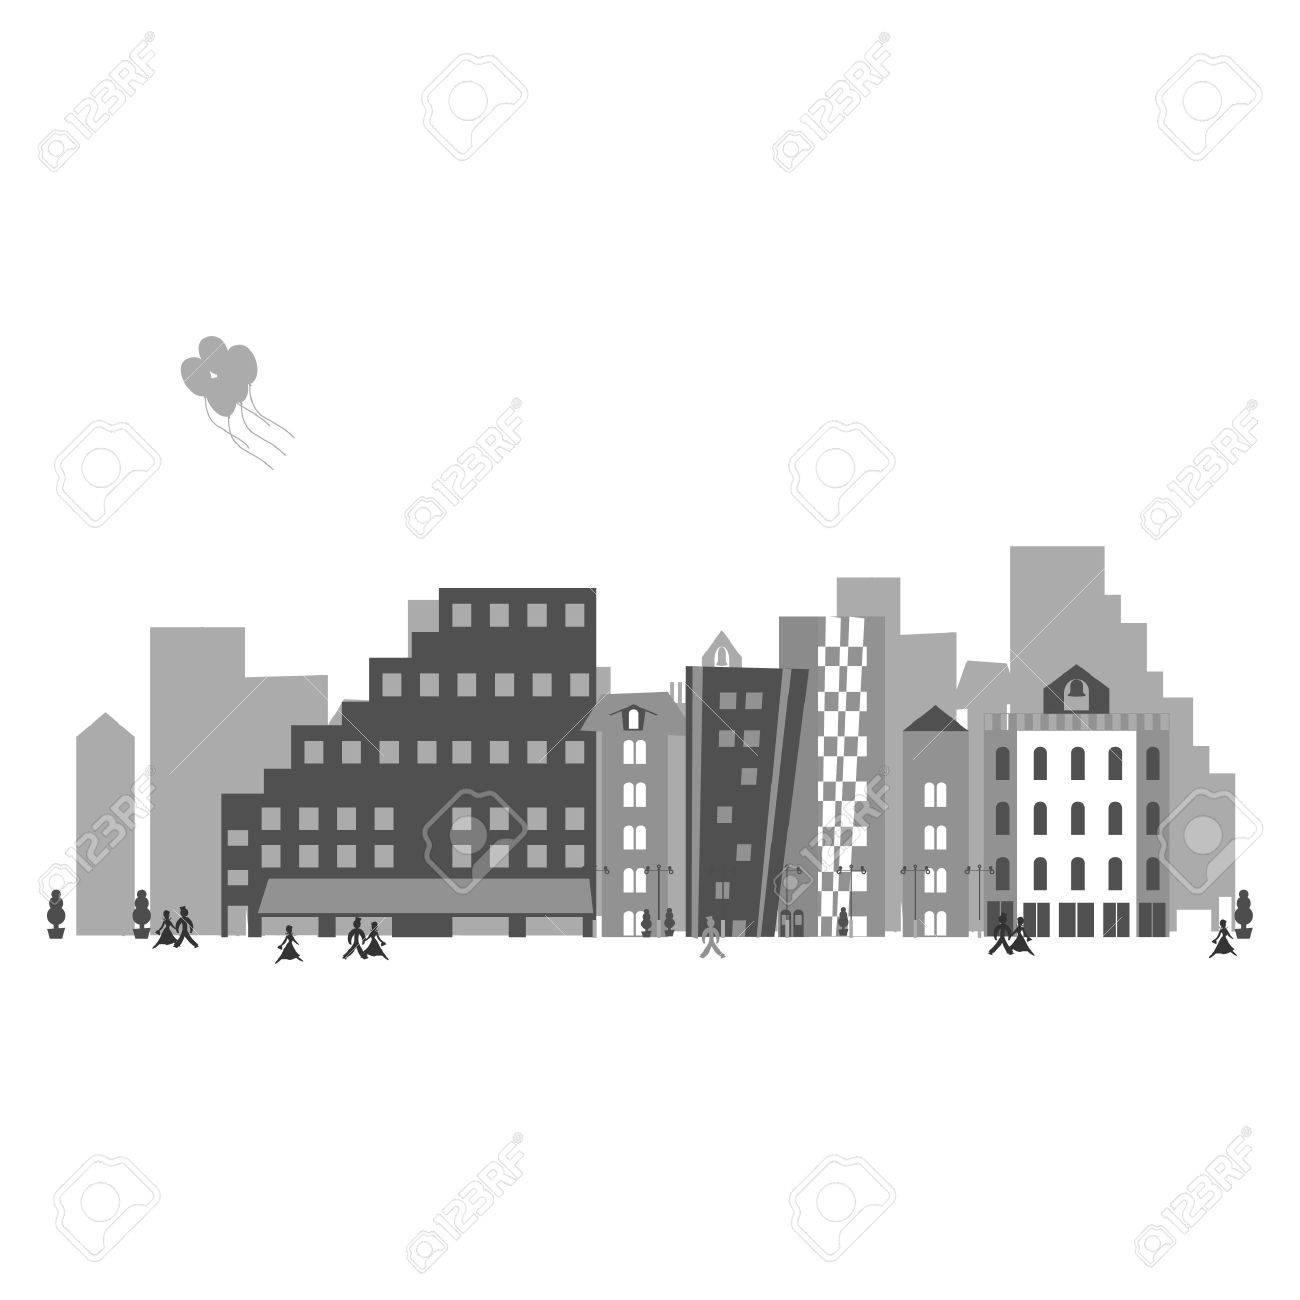 Town Stock Vector - 11838795